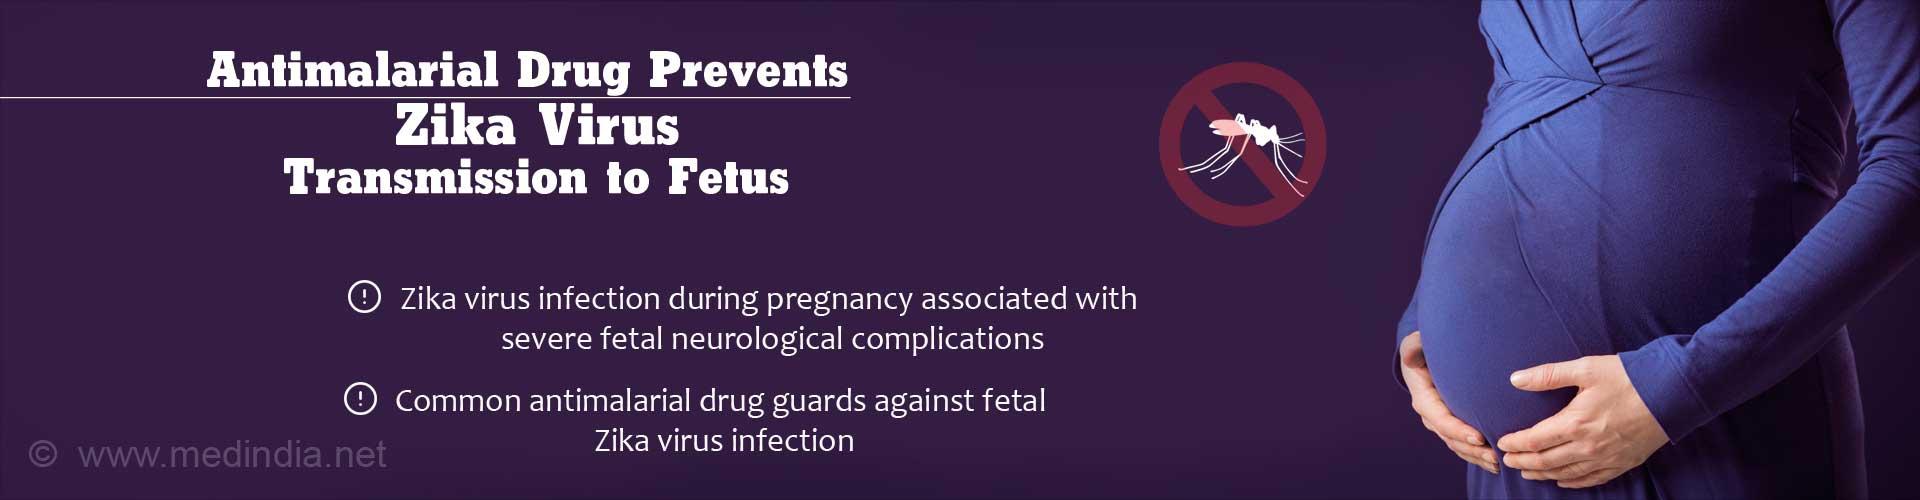 Antimalarial Drug Prevents Zika Virus Transmission to Fetus - Zika virus during pregnancy associated with severe fetal neurological complications - Common antimalarial drug guards against fetal Zika virus infection